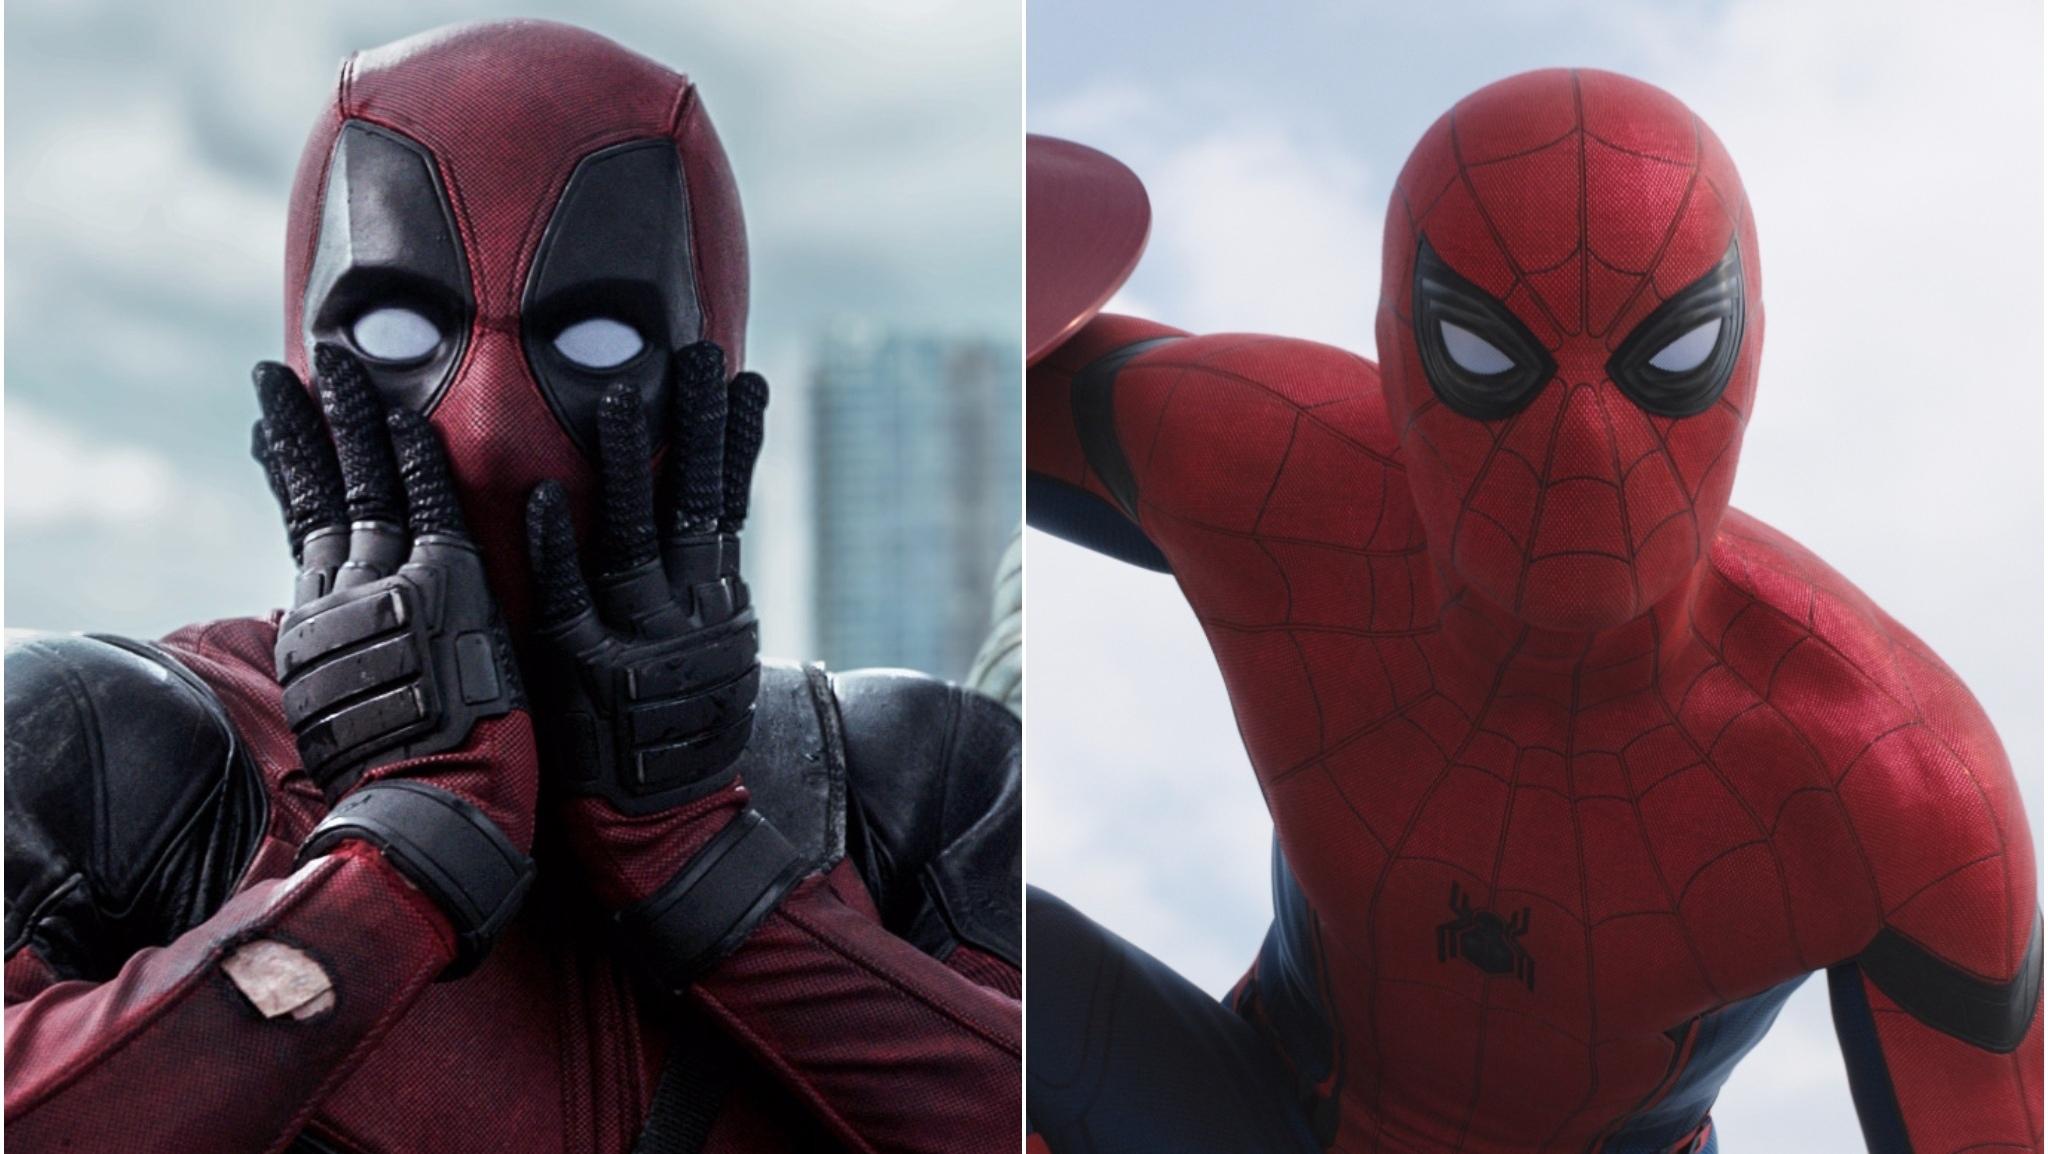 Spider-man a Deadpool se možná objeví v jednom filmu